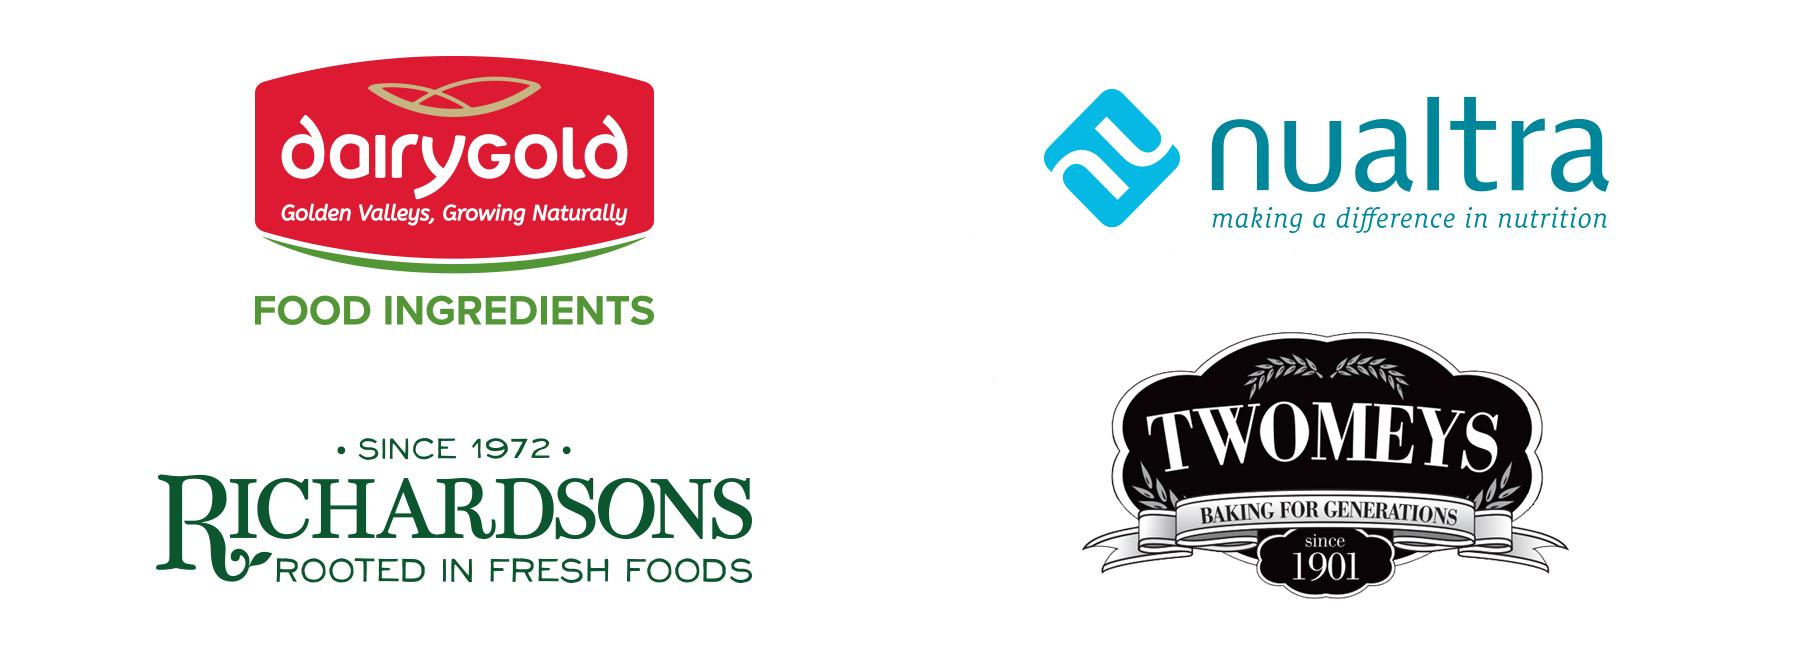 Frawley Branding | Branding Agency | Brand Strategy & Design | Sectors